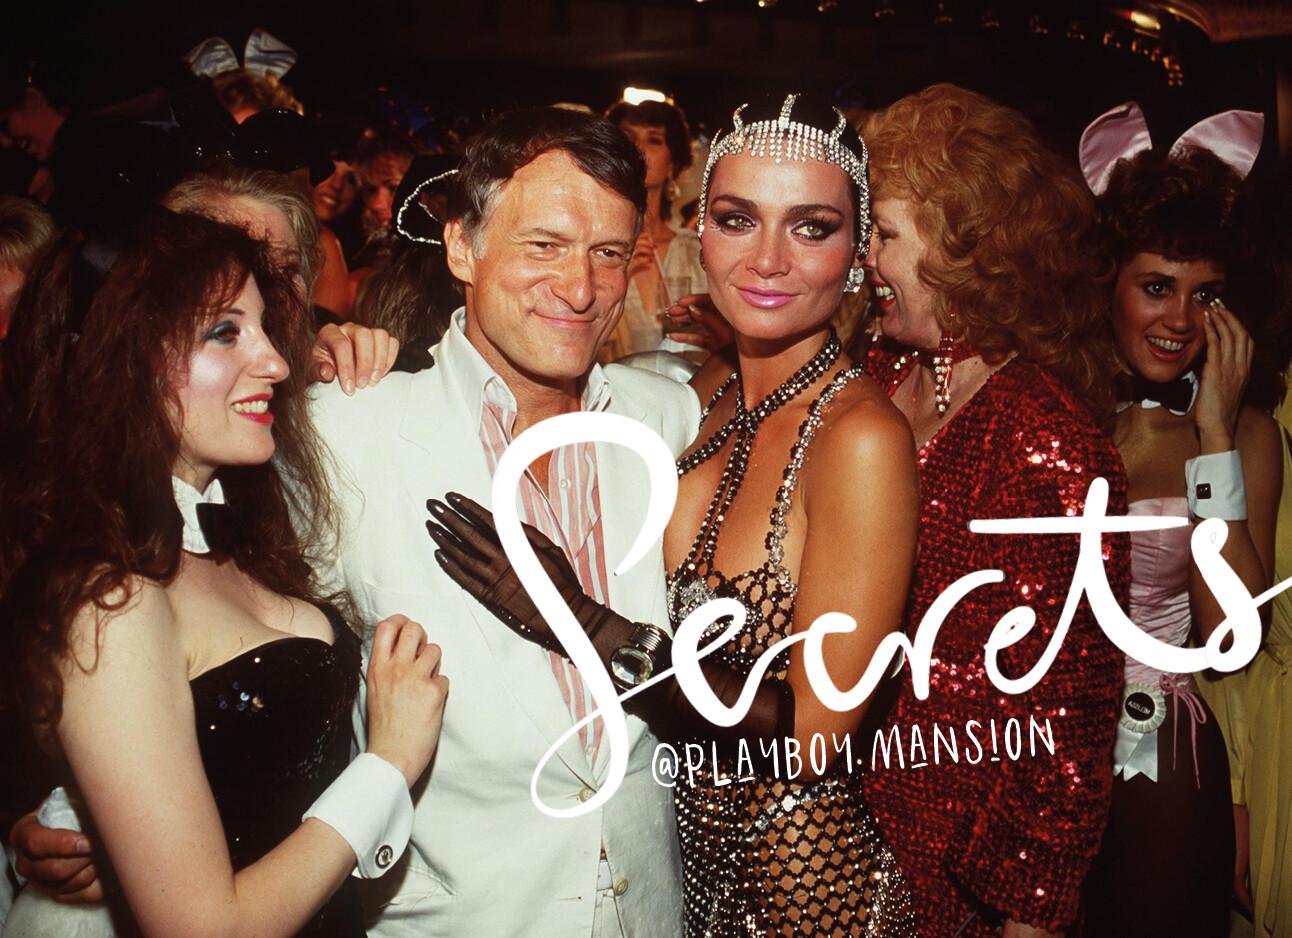 De grimmige geheimen achter de Playboy Mansion